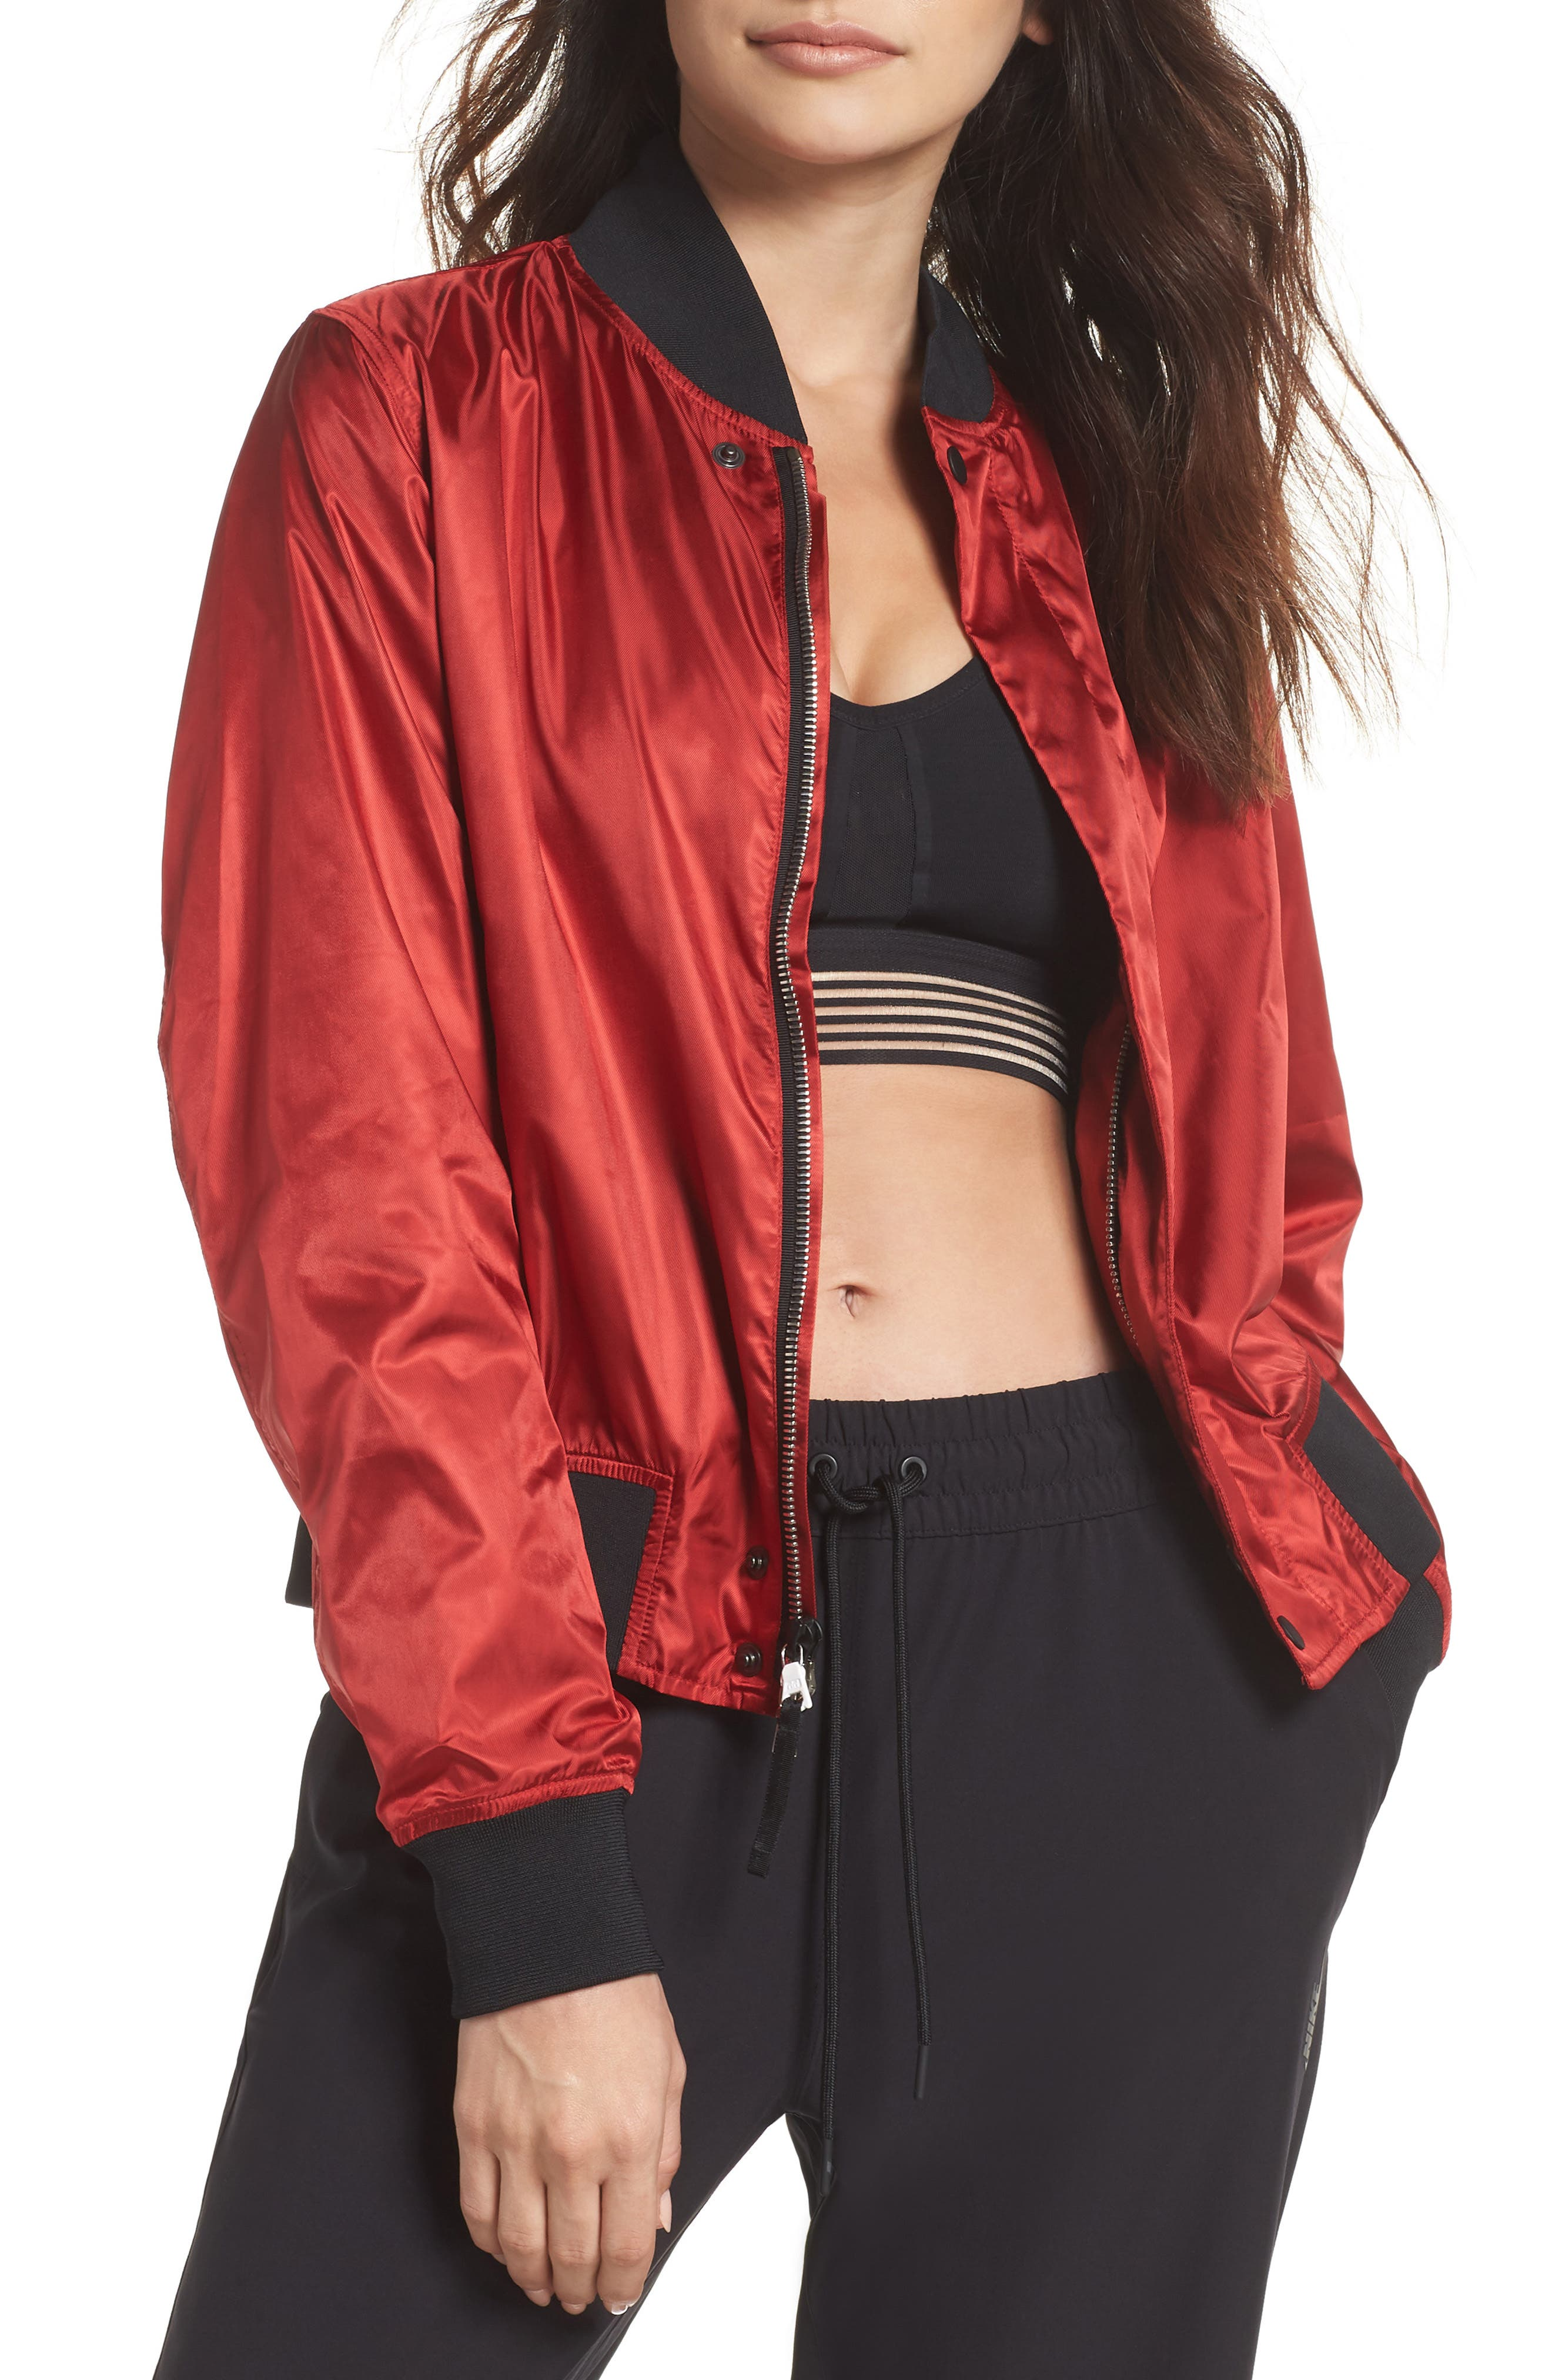 NikeLab Collection Women's Satin Bomber Jacket,                             Main thumbnail 1, color,                             Gym Red/ Black